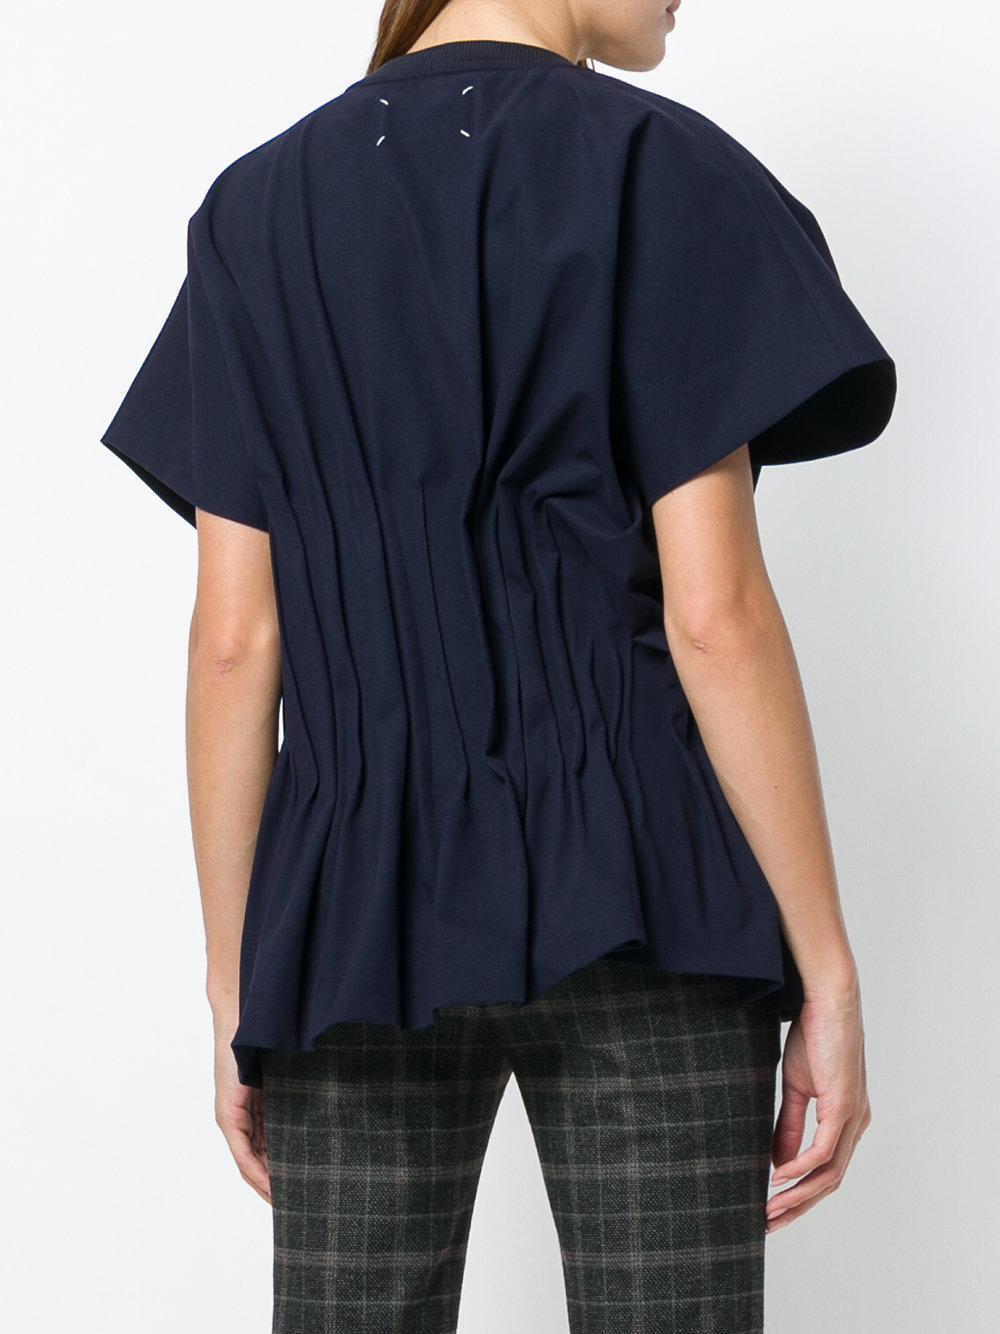 Sale 100% Original Finishline Sale Online ruched waist shirt - Green Maison Martin Margiela Outlet Very Cheap Buy Authentic Online IuNCCNRTJU